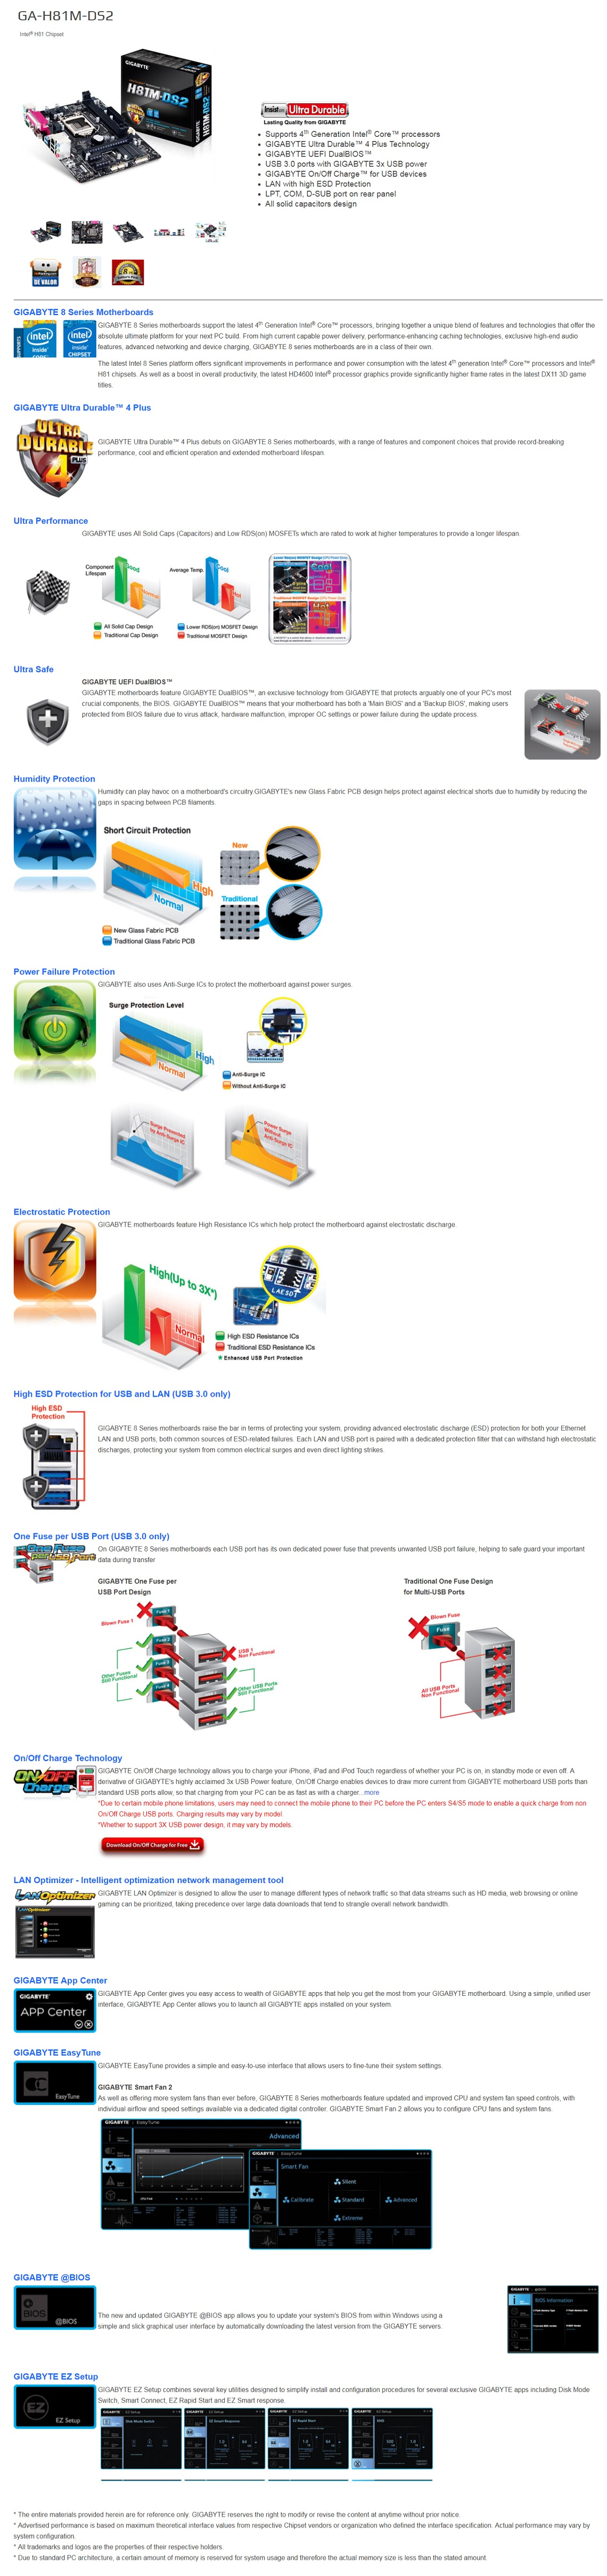 Gigabyte GA-H81M-DS2 Intel H81 LGA1150 DDR3 Motherboard Micro ATX Motherboard